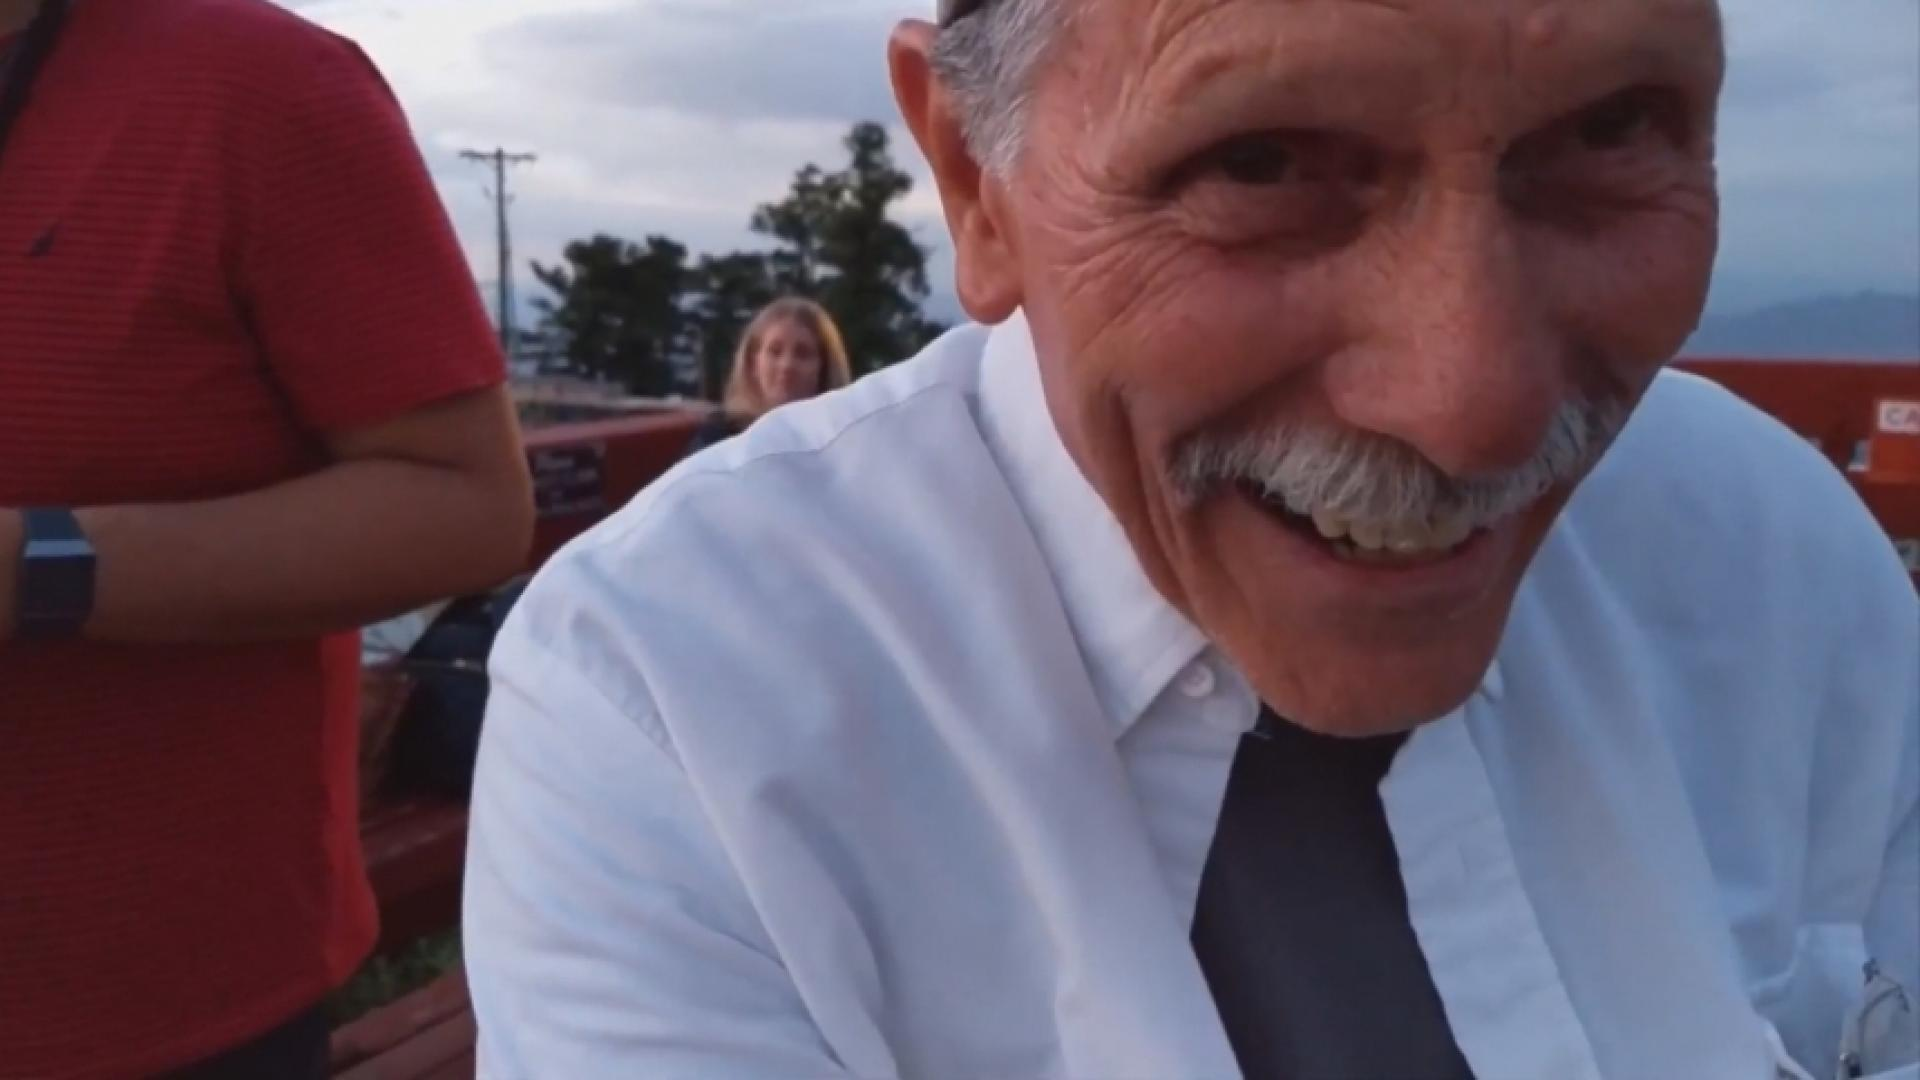 Albuquerque grandpa